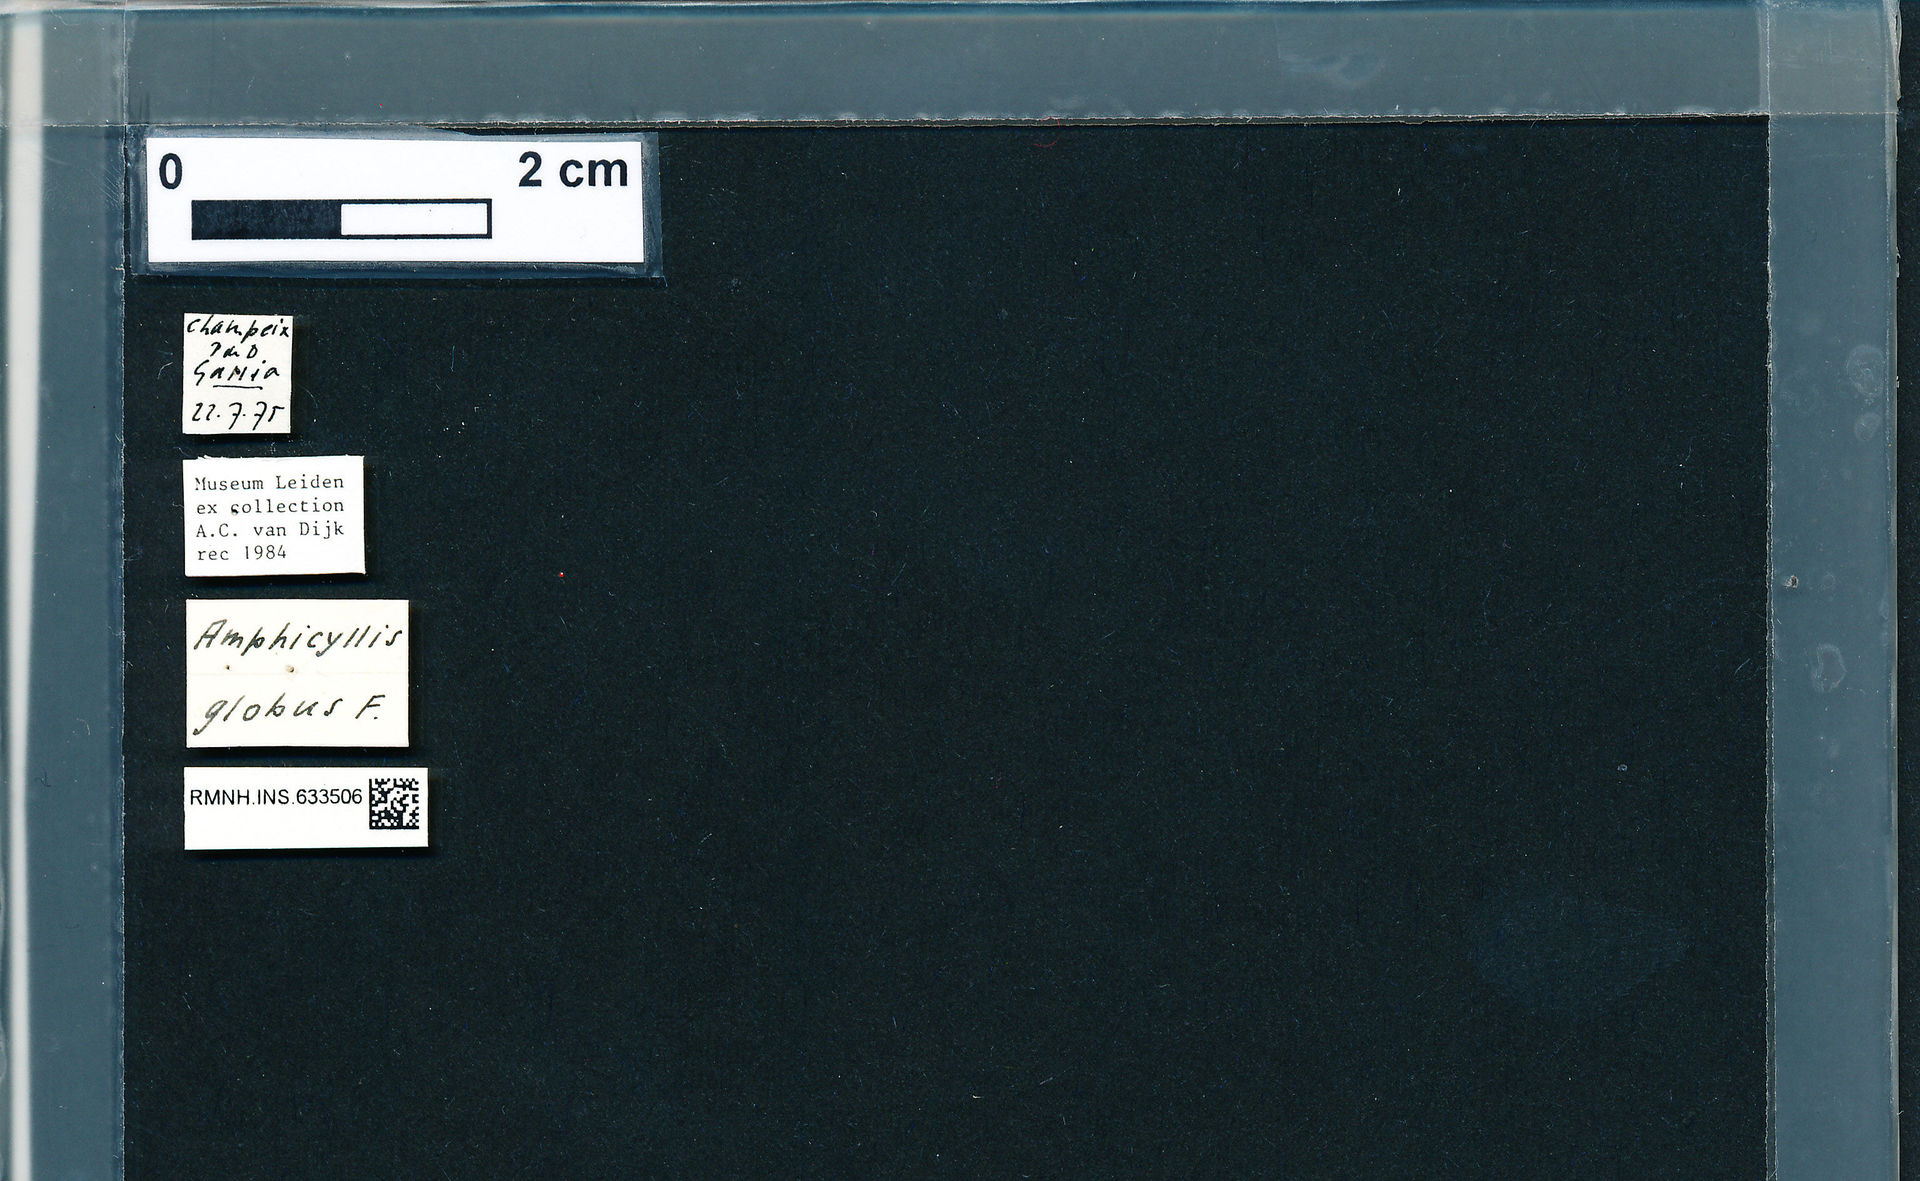 RMNH.INS.633506   Amphicyllis globus Fab.